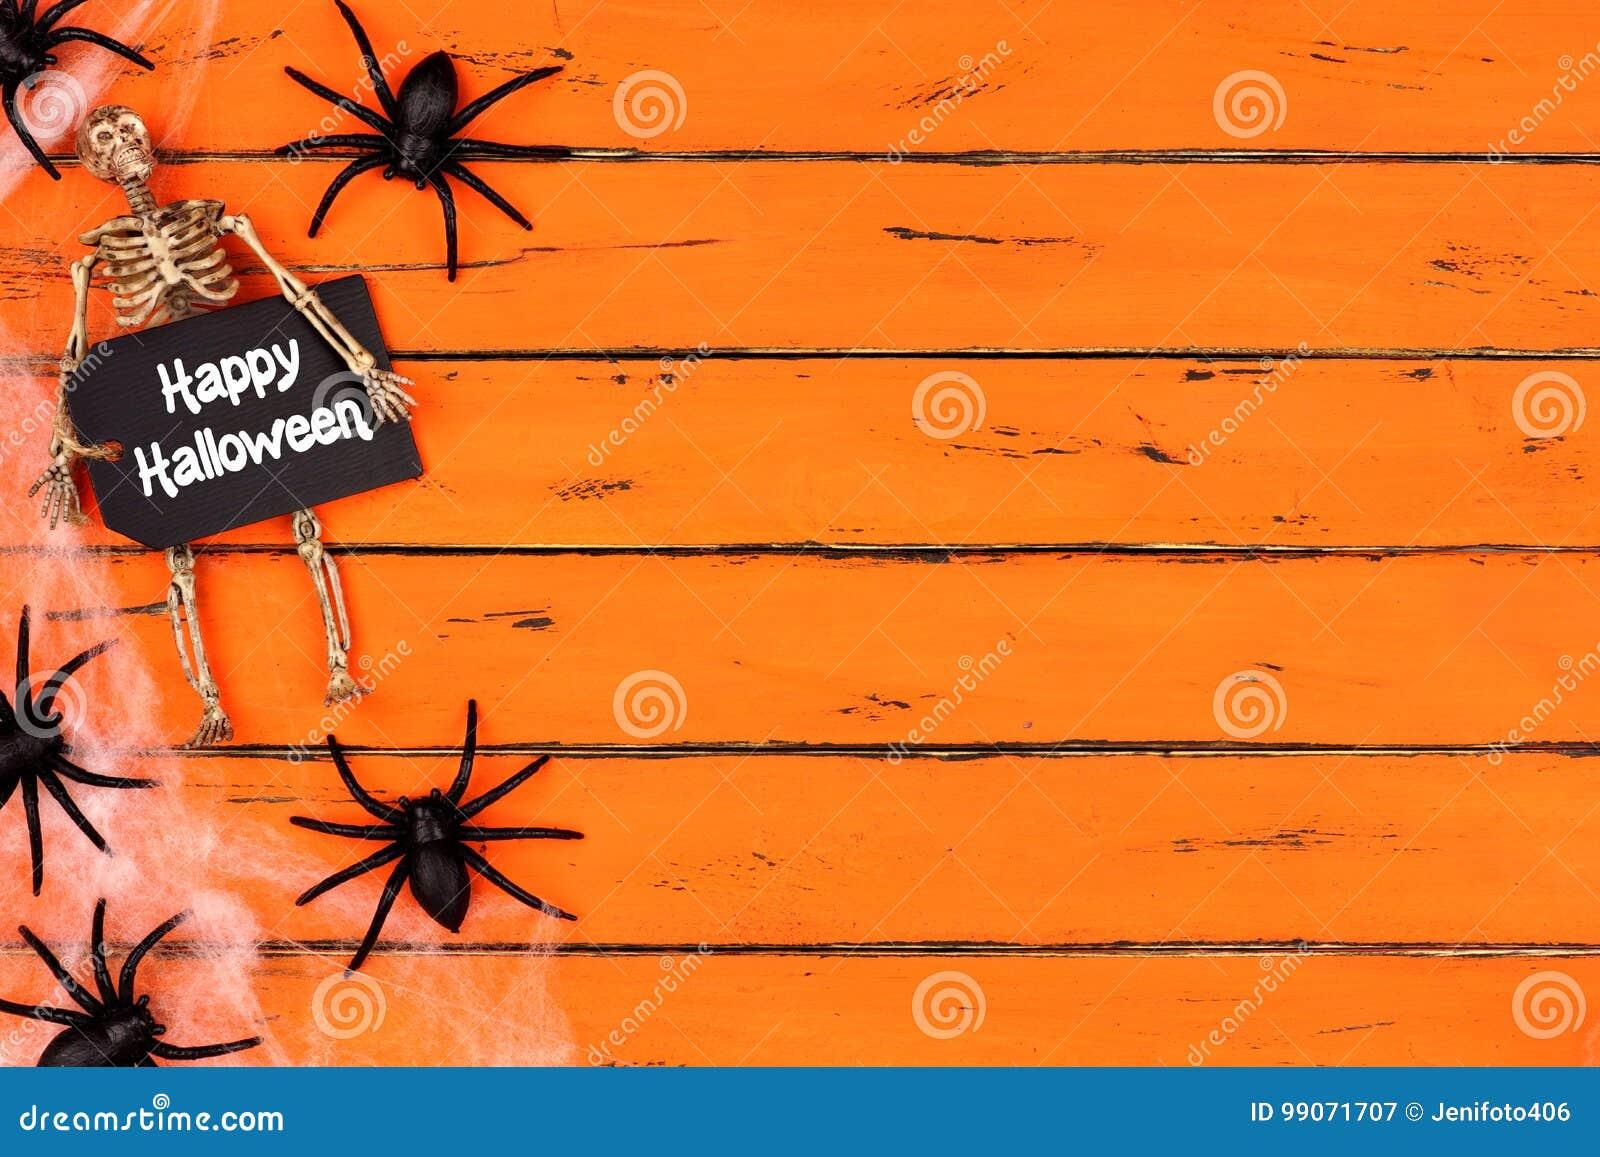 Happy Halloween tag with spider web side border on orange wood